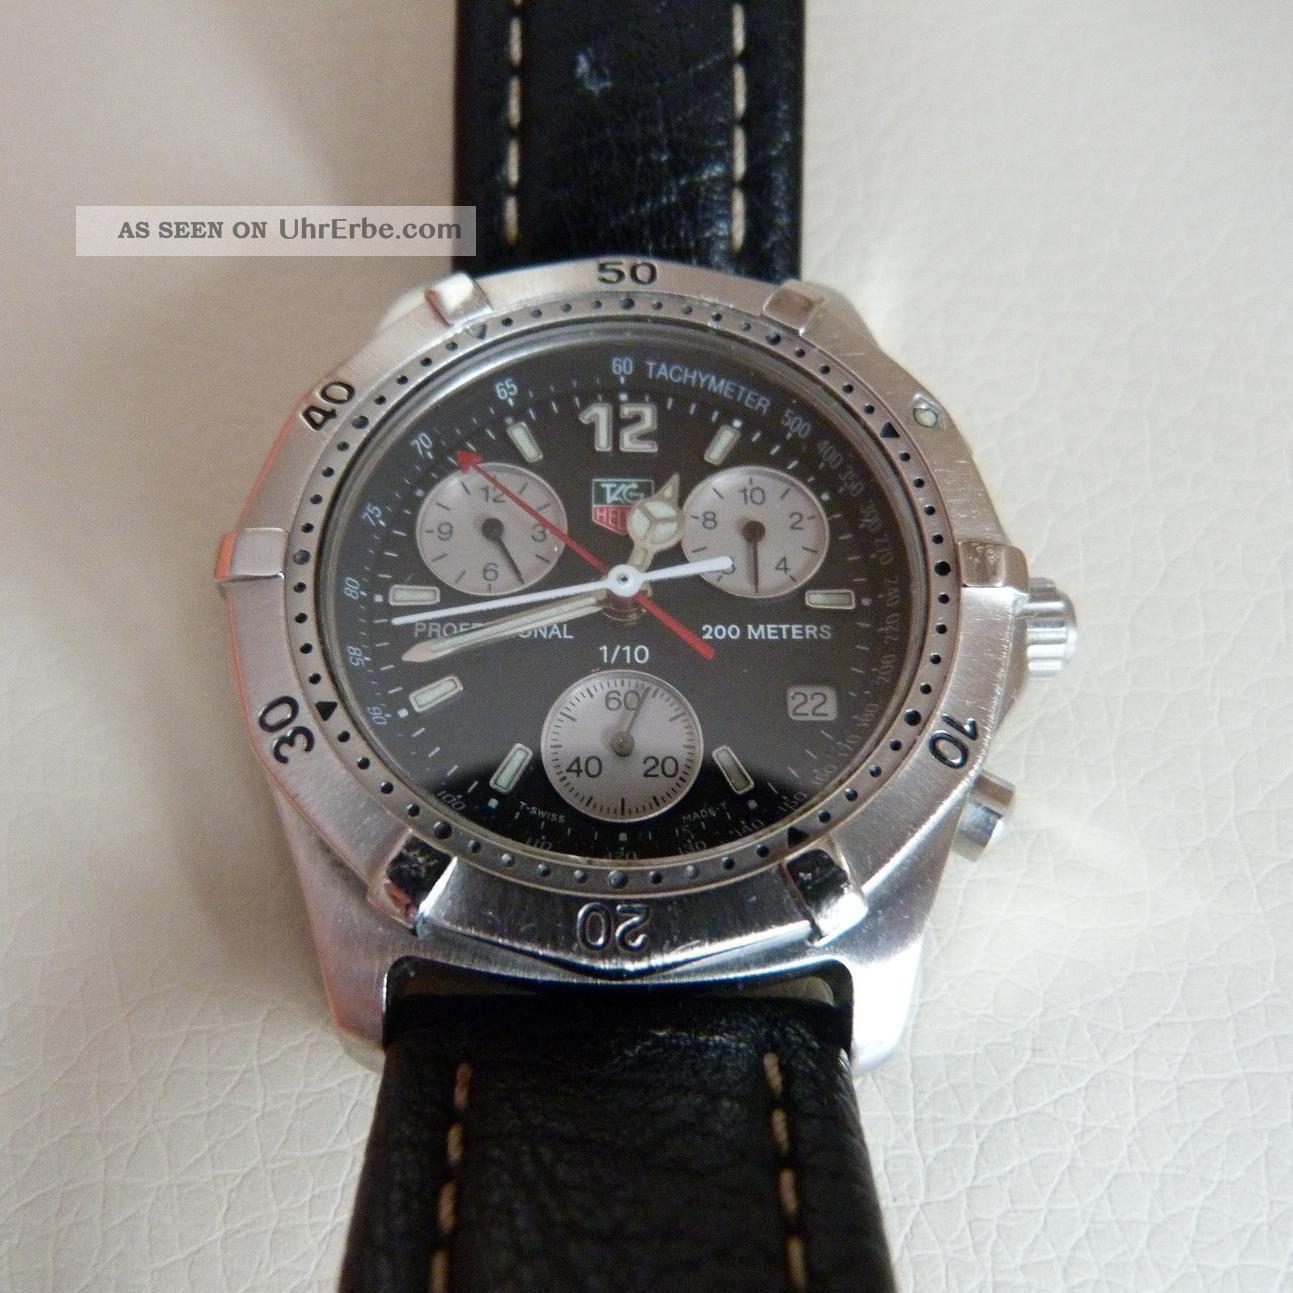 Tag Heuer Herren Uhr Professional Schweiz Luxusuhr Chronograph Armbanduhren Bild